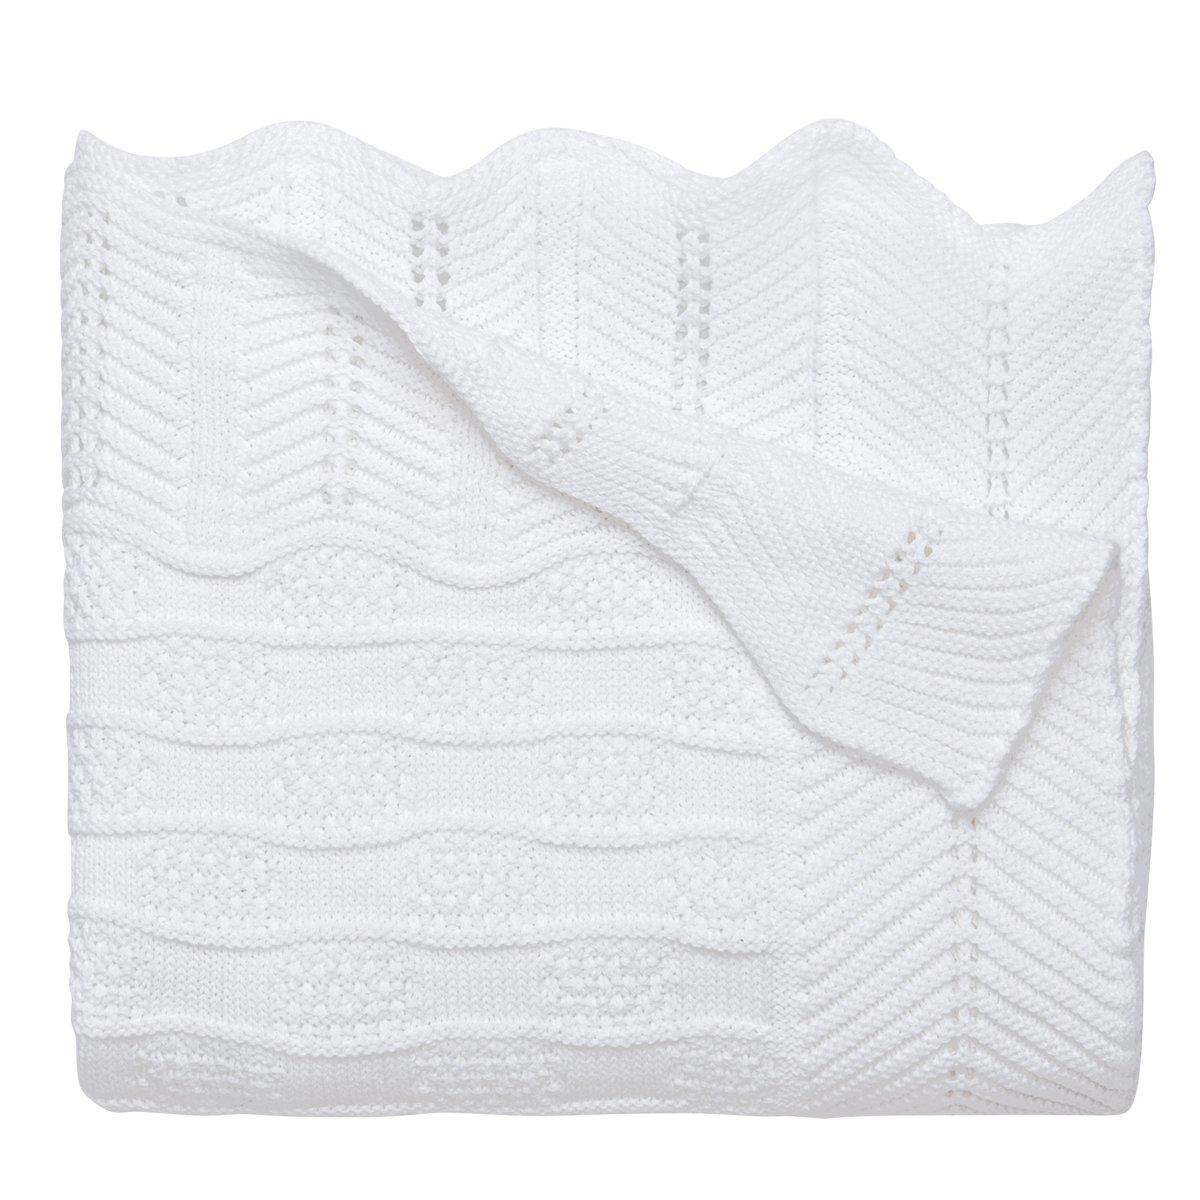 Elegant Baby Premium 100% Cotton Knit Blanket, White Texture Knit, 30'' x 40'' by Elegant Baby